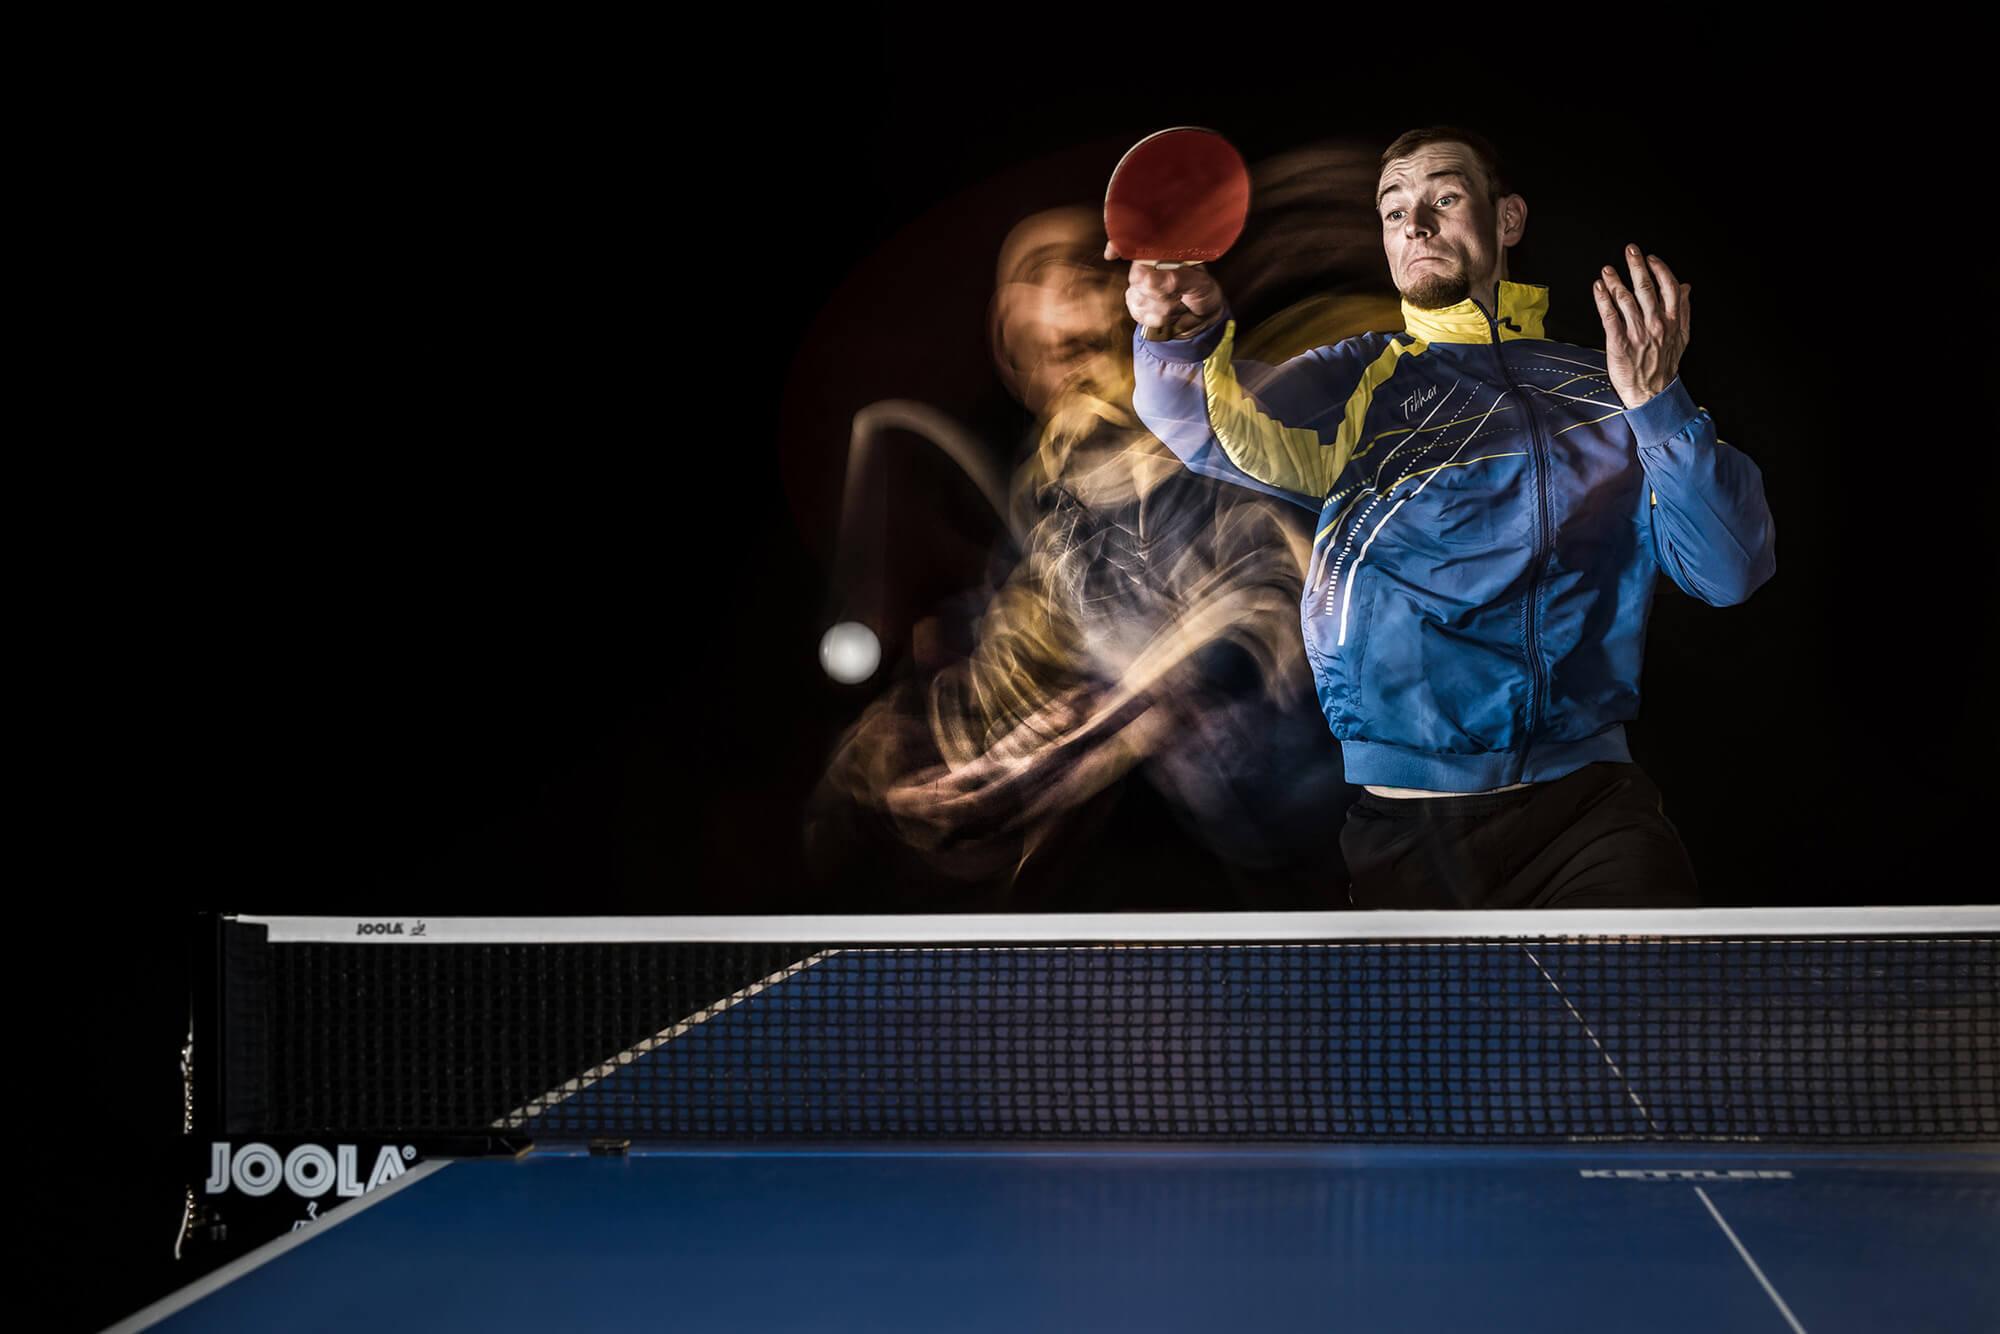 table tennis forehand joola product photography produktfotografie flap photography fotograf philipp greindl photographer linz austria